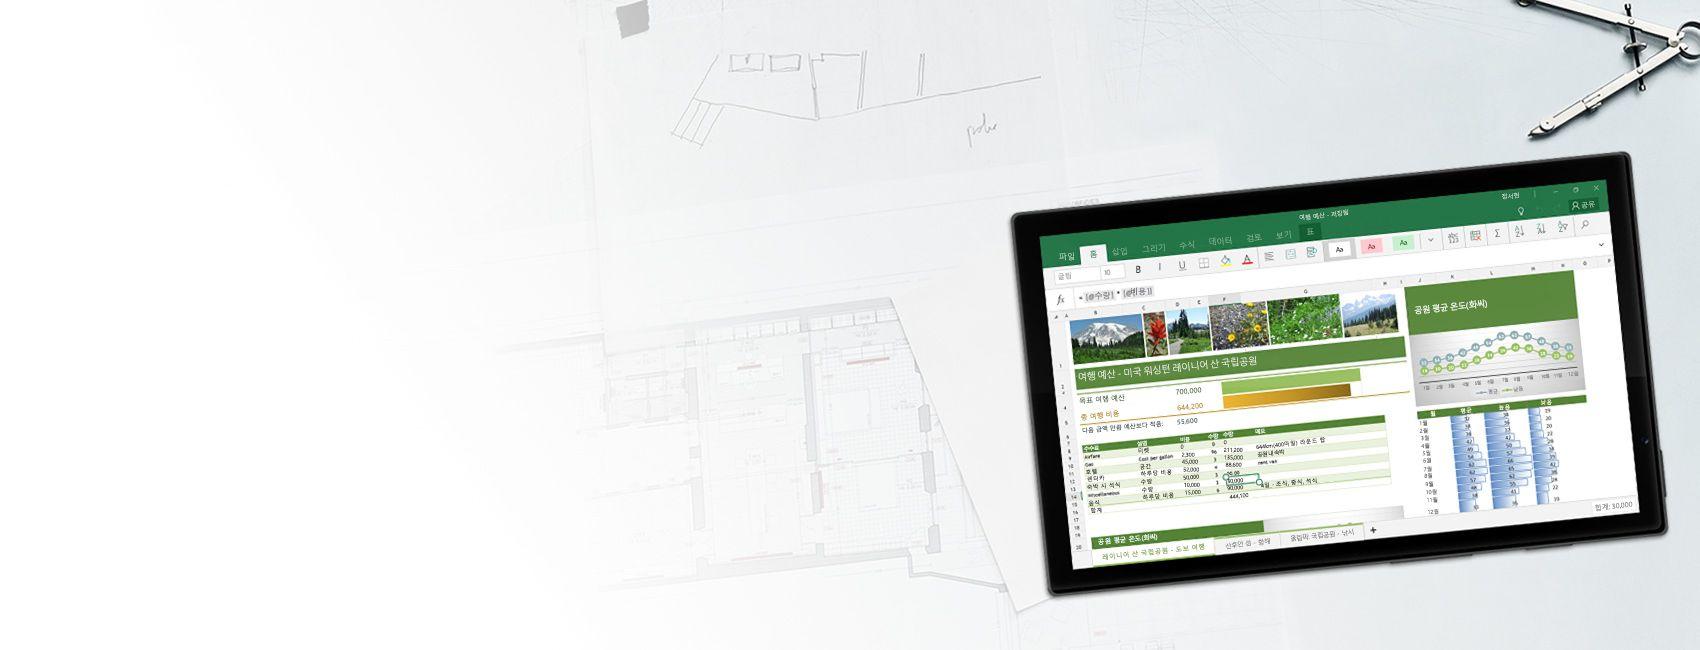 Windows 10 Mobile용 Excel로 작성된 견본 차트 및 여행 예산 보고서를 포함하는 Excel 스프레드시트가 표시된 Windows 태블릿